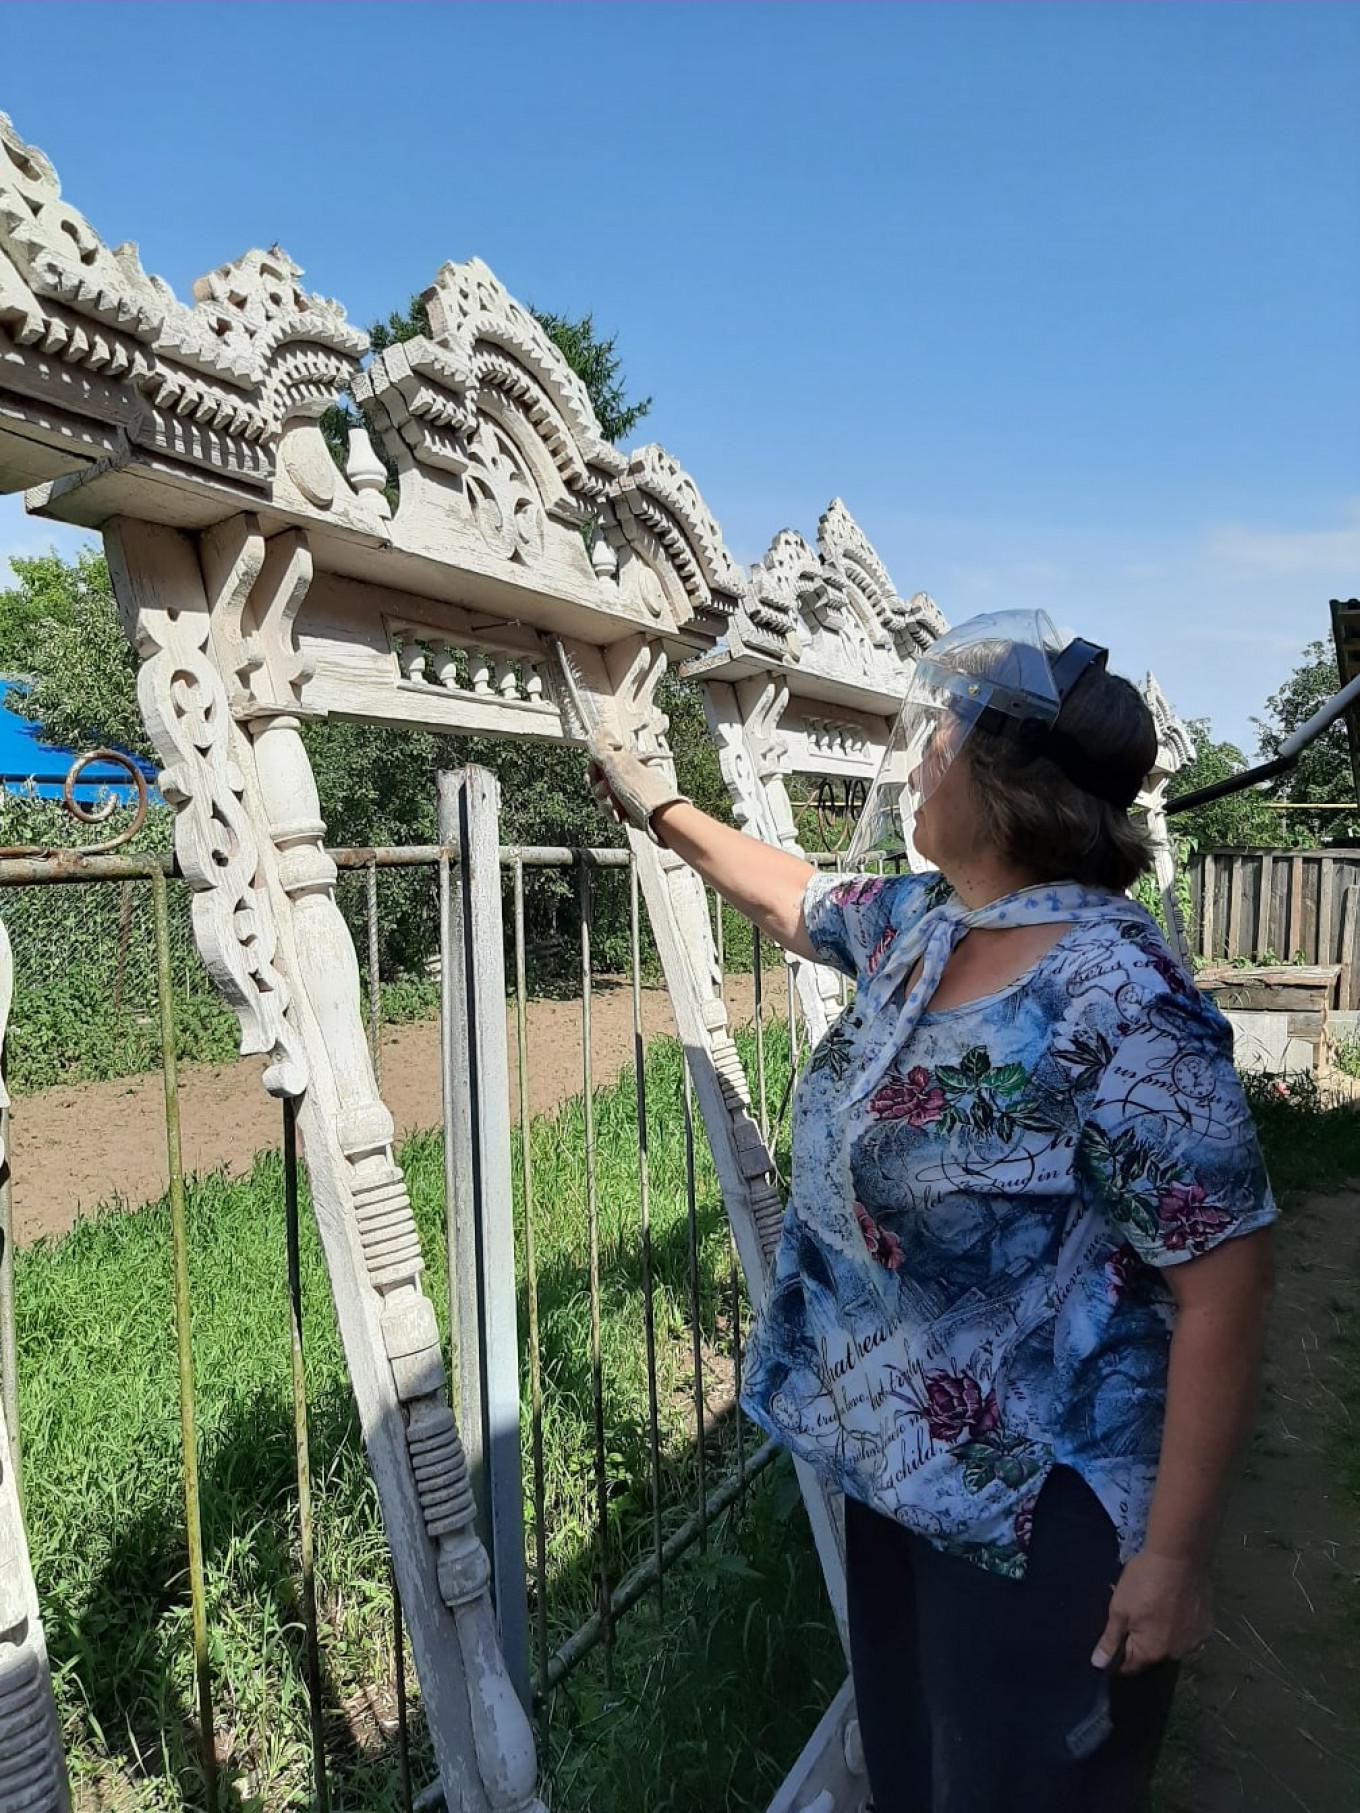 Work in Kholui differs from city restorations. Tom Sawyer Fest